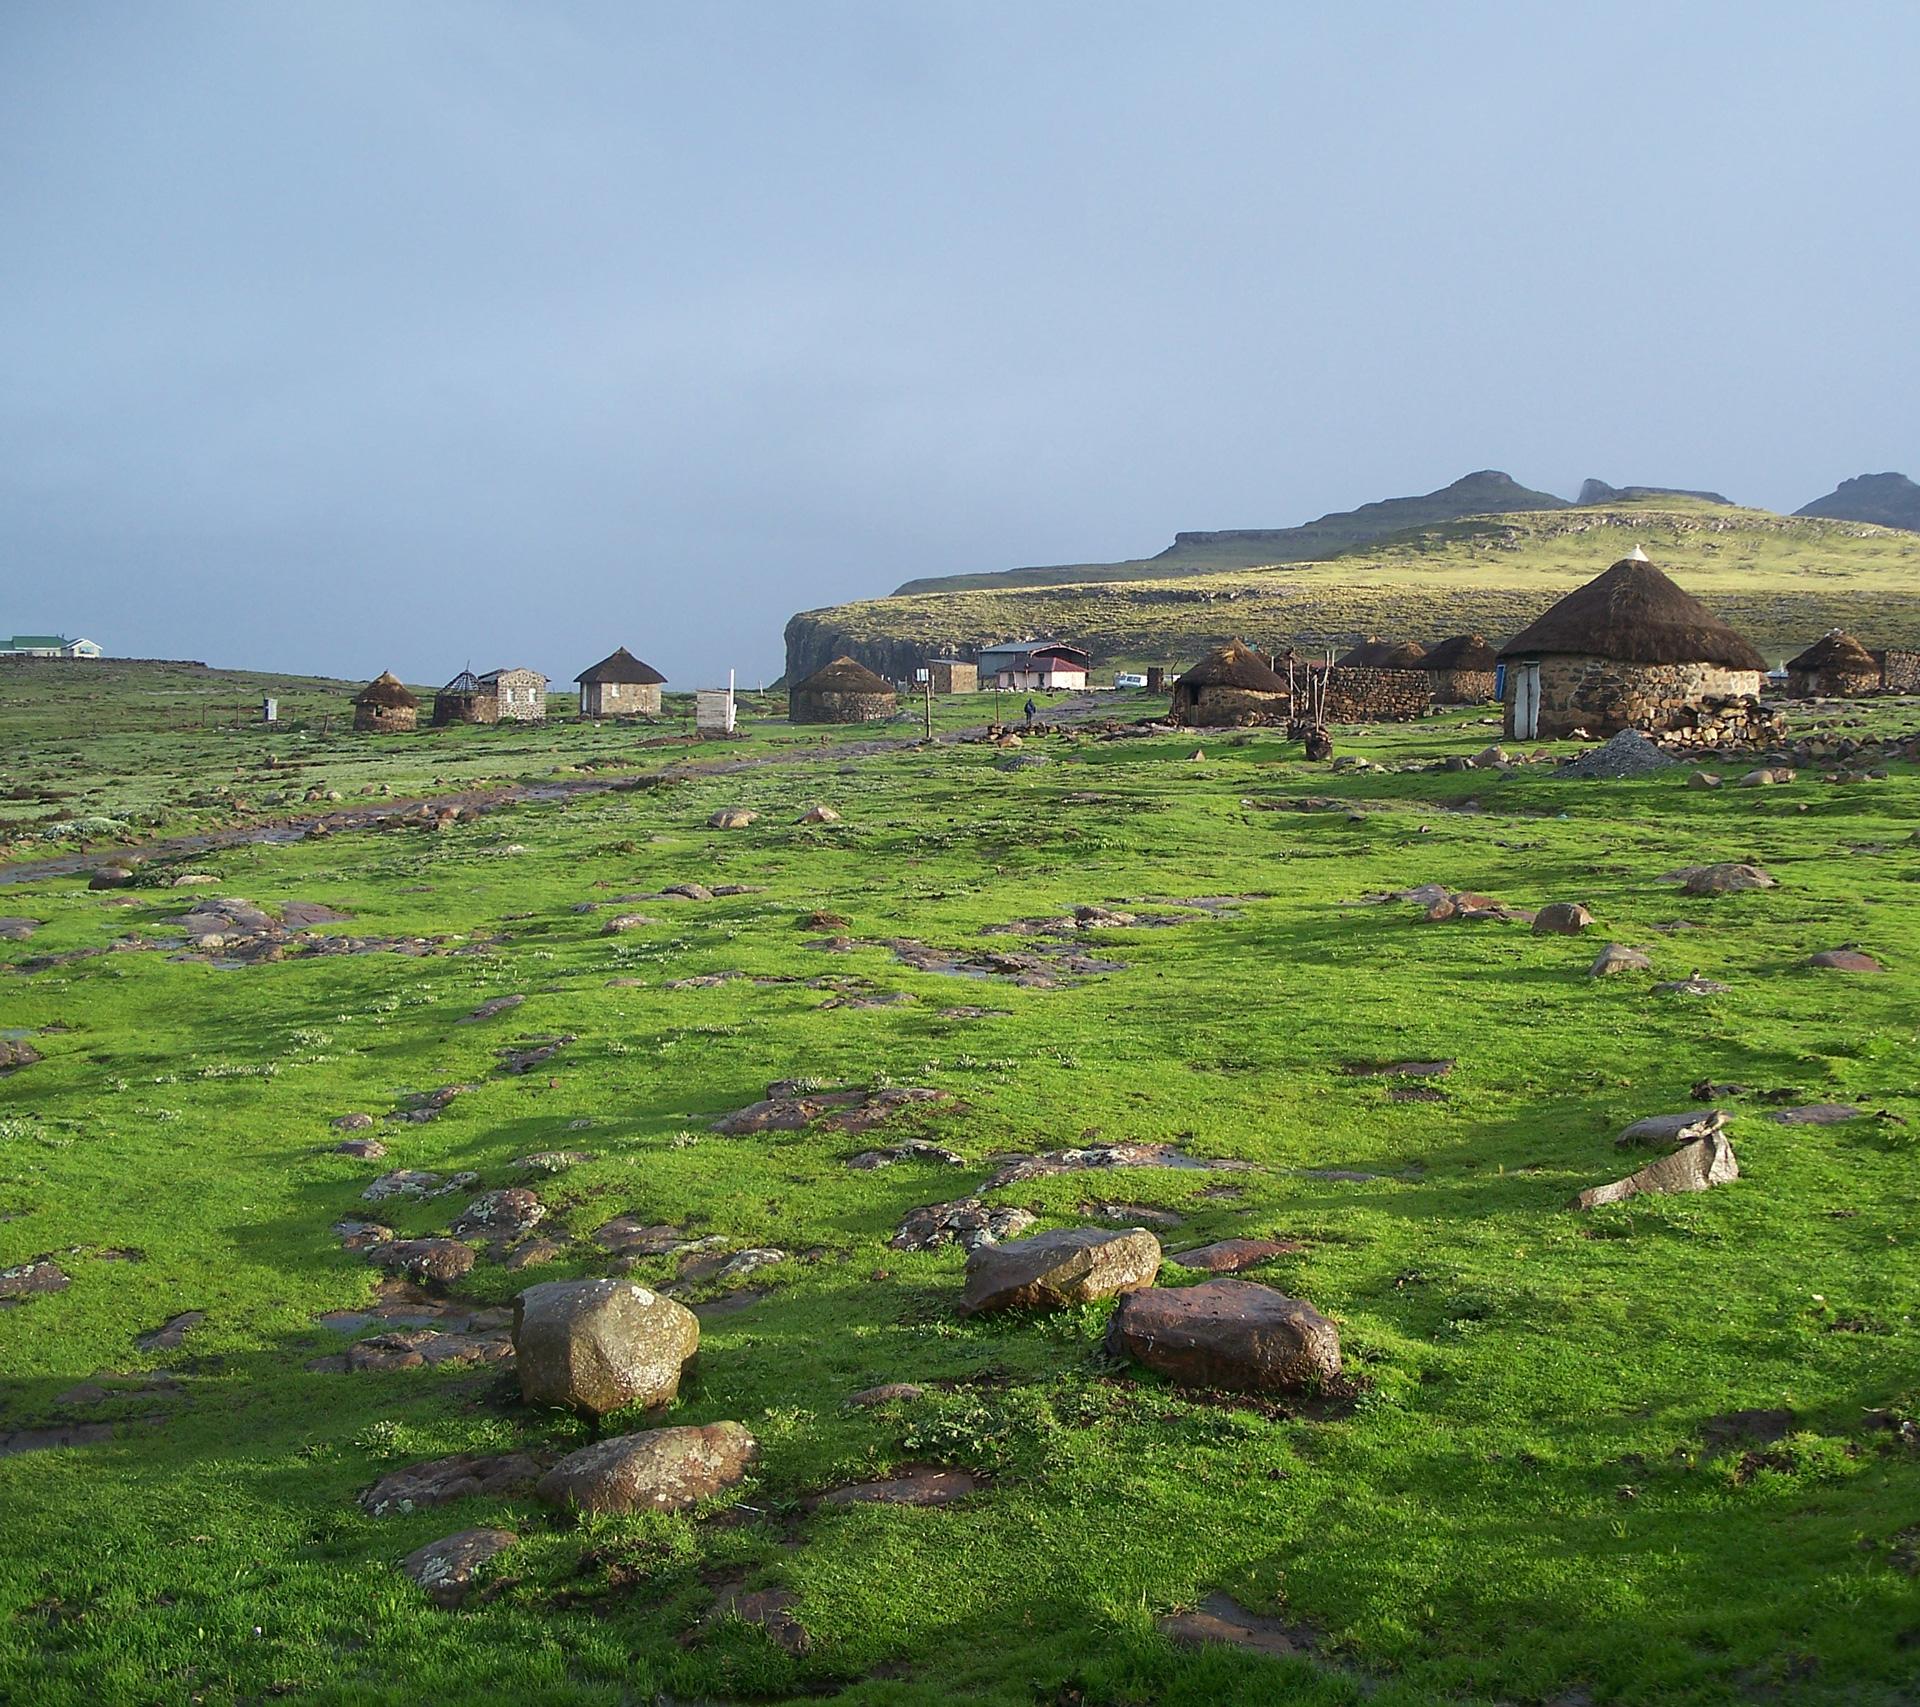 Rangelands in the Maloti–Drakensberg mountains. Photo by V. Ralph Clark